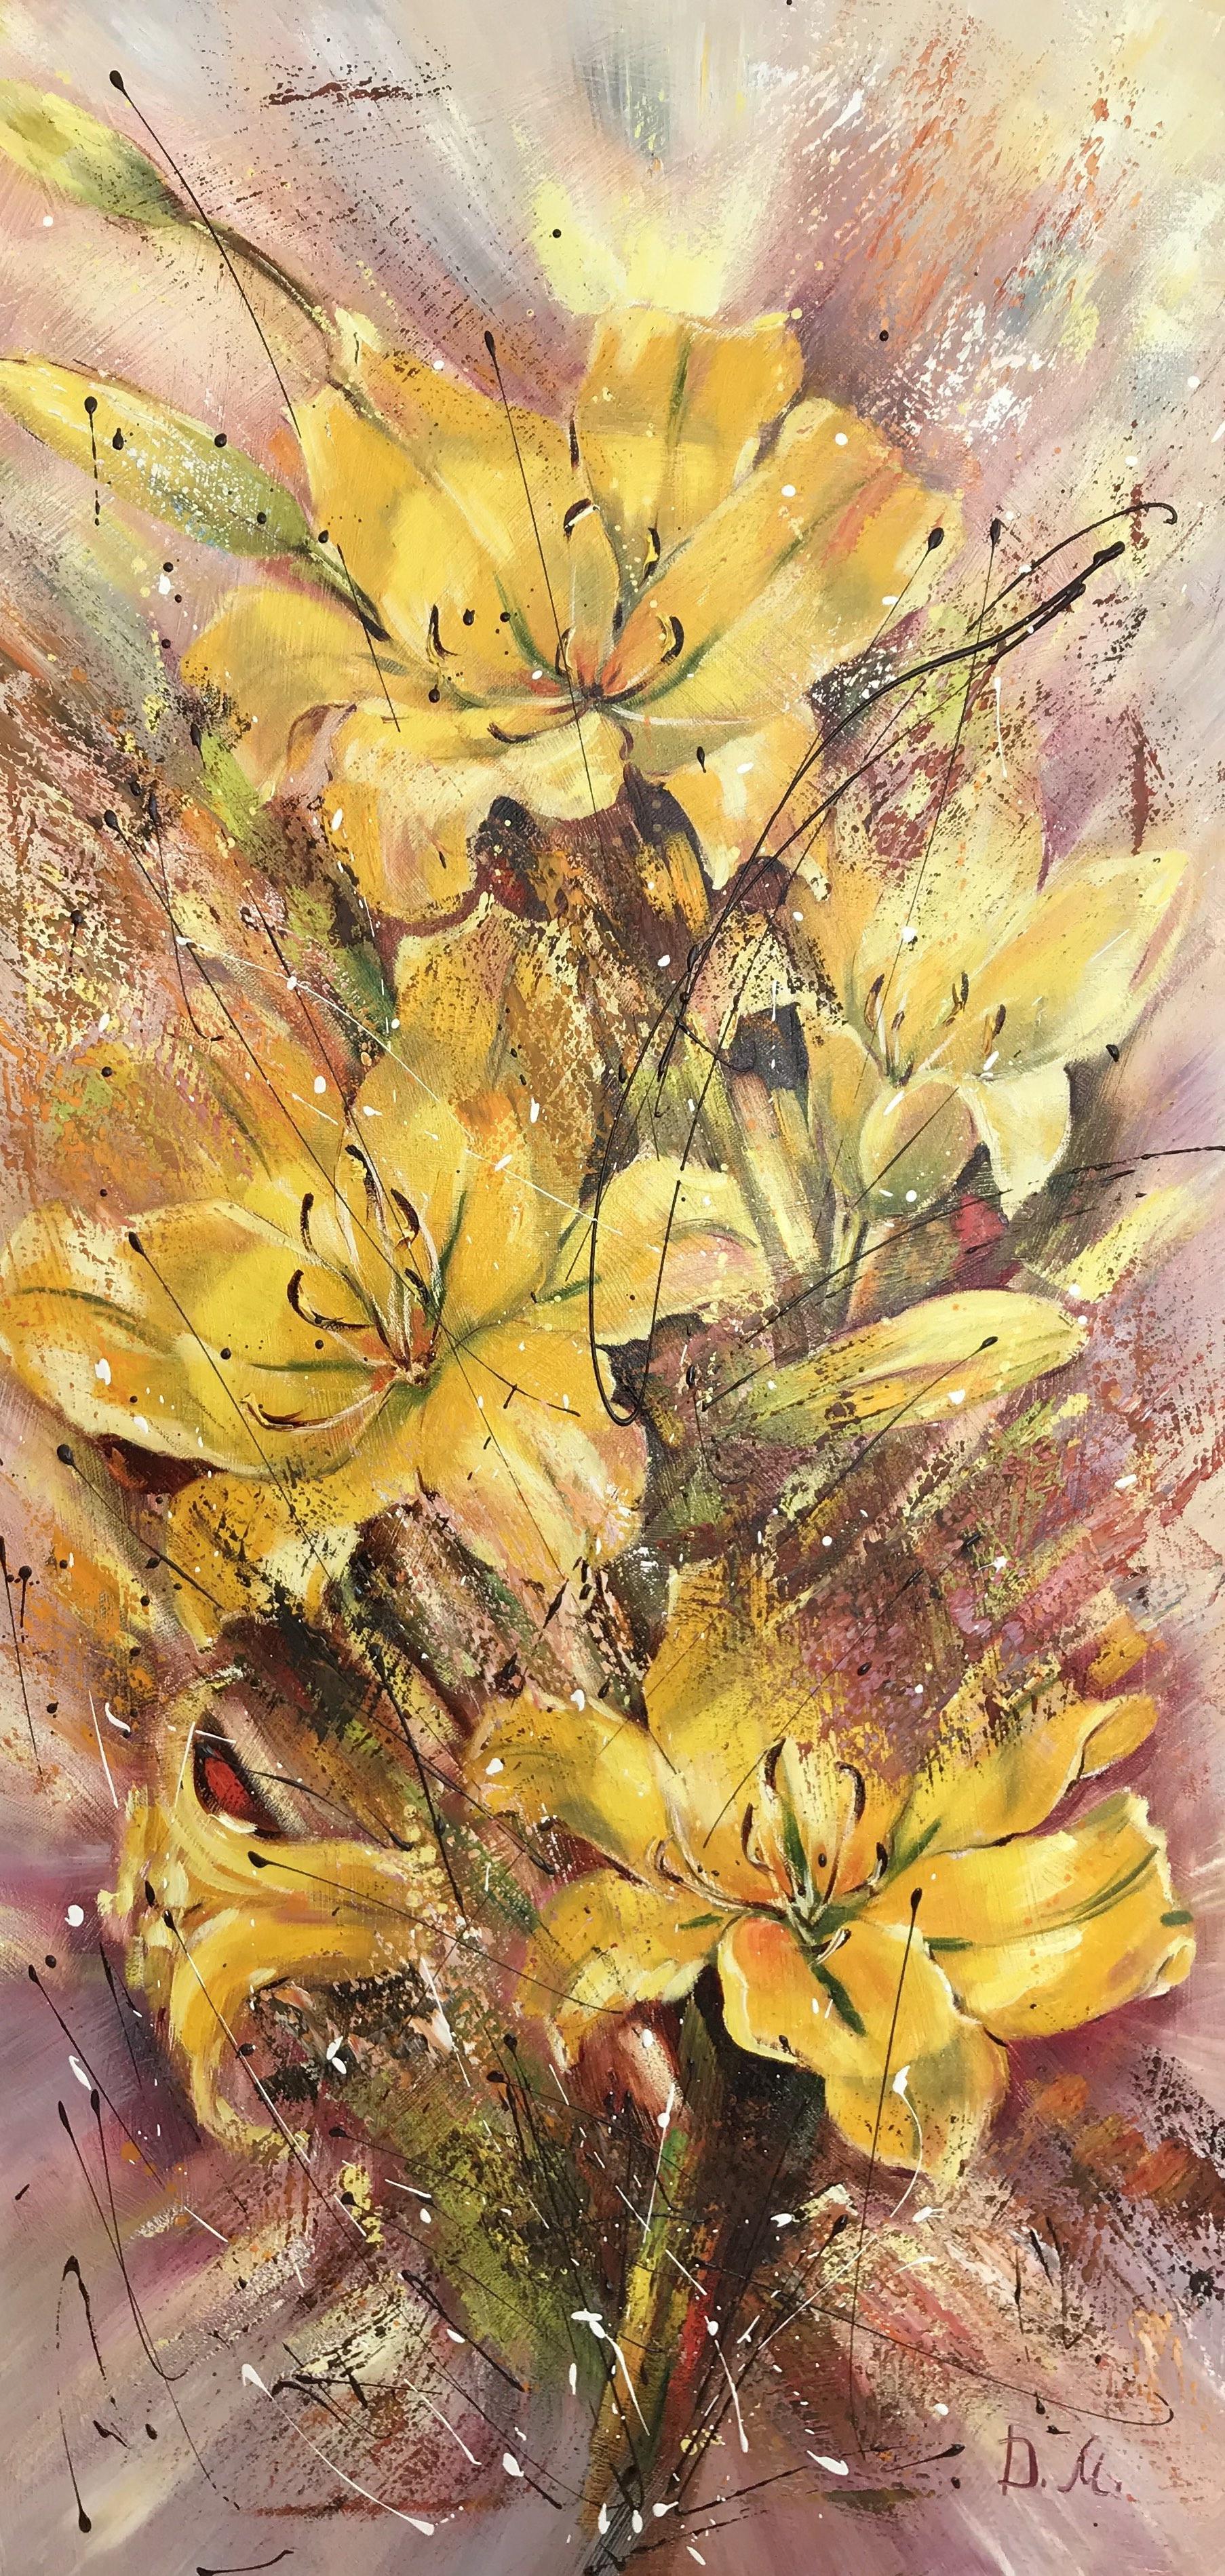 Диана Владимировна Маливани. Yellow Lilies